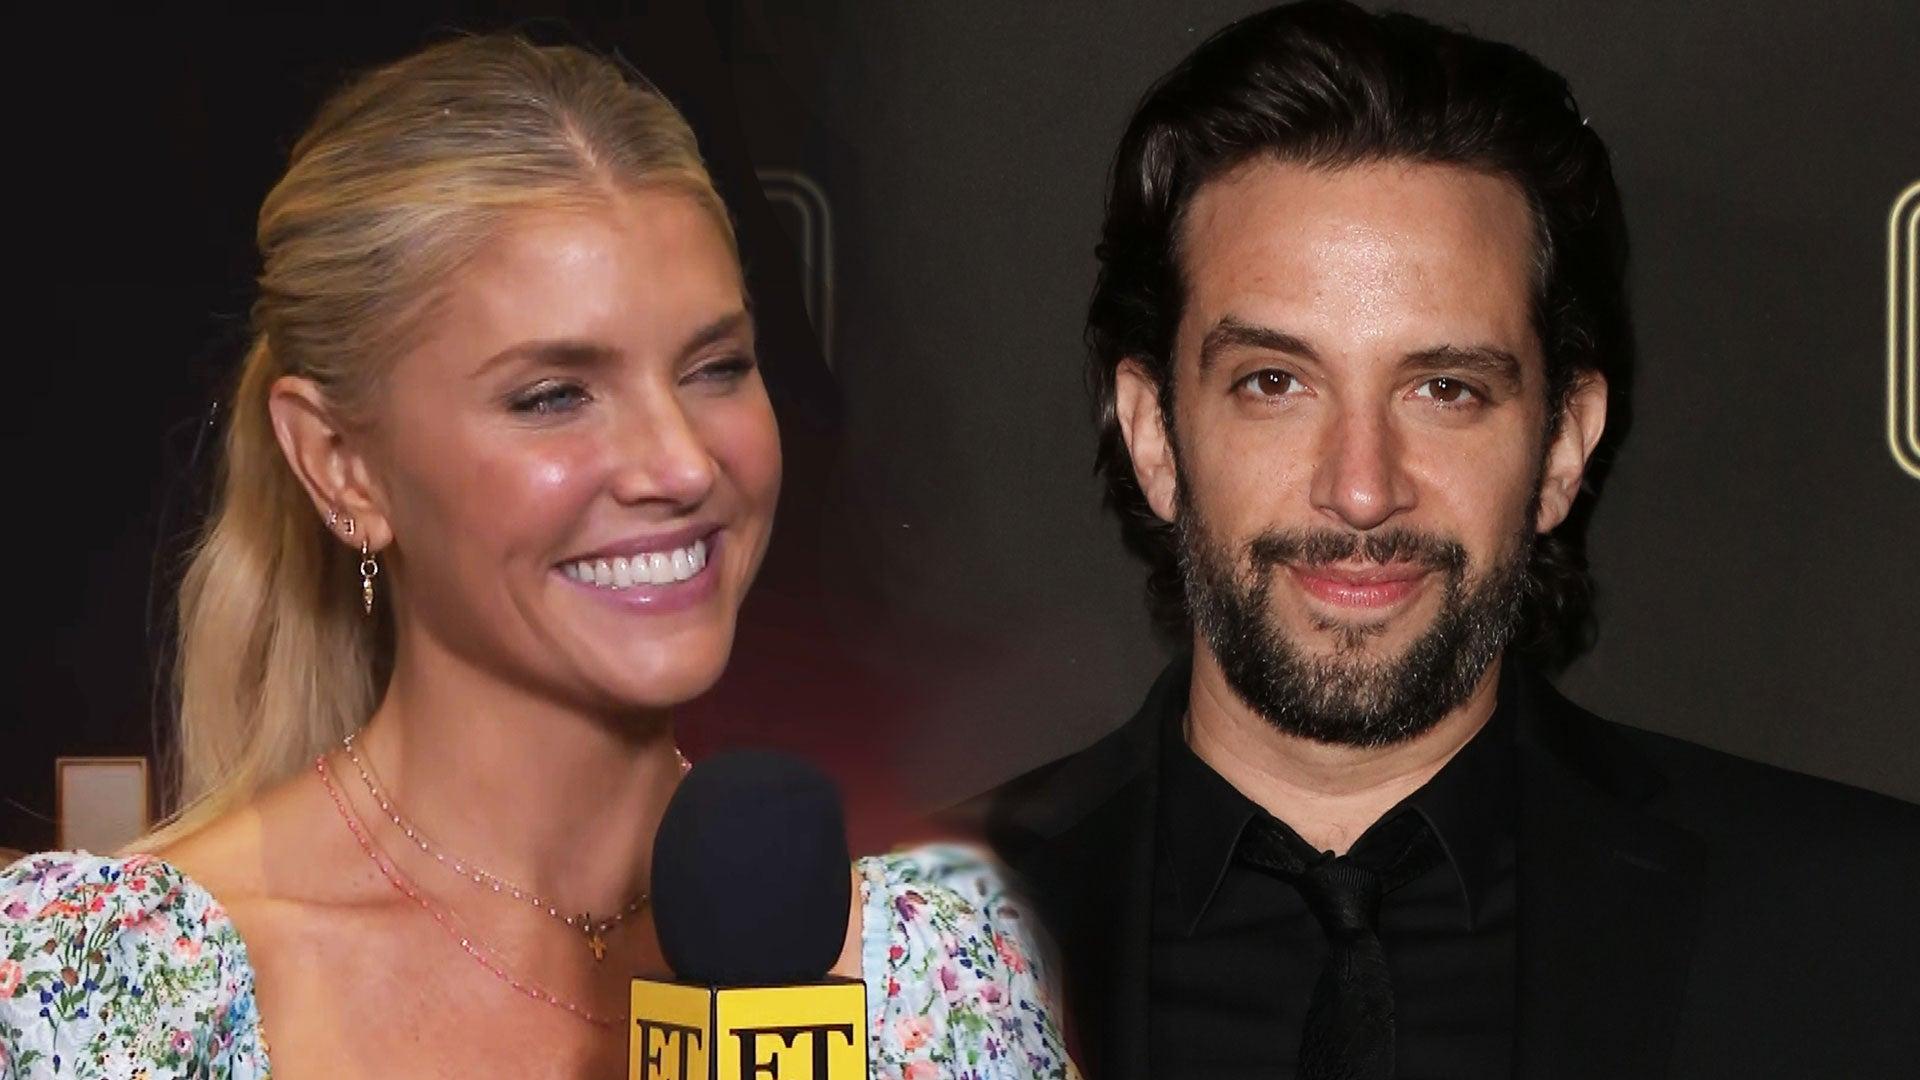 'DWTS:' Amanda Kloots Will Honor Late Husband Nick Cordero (Exclusive)